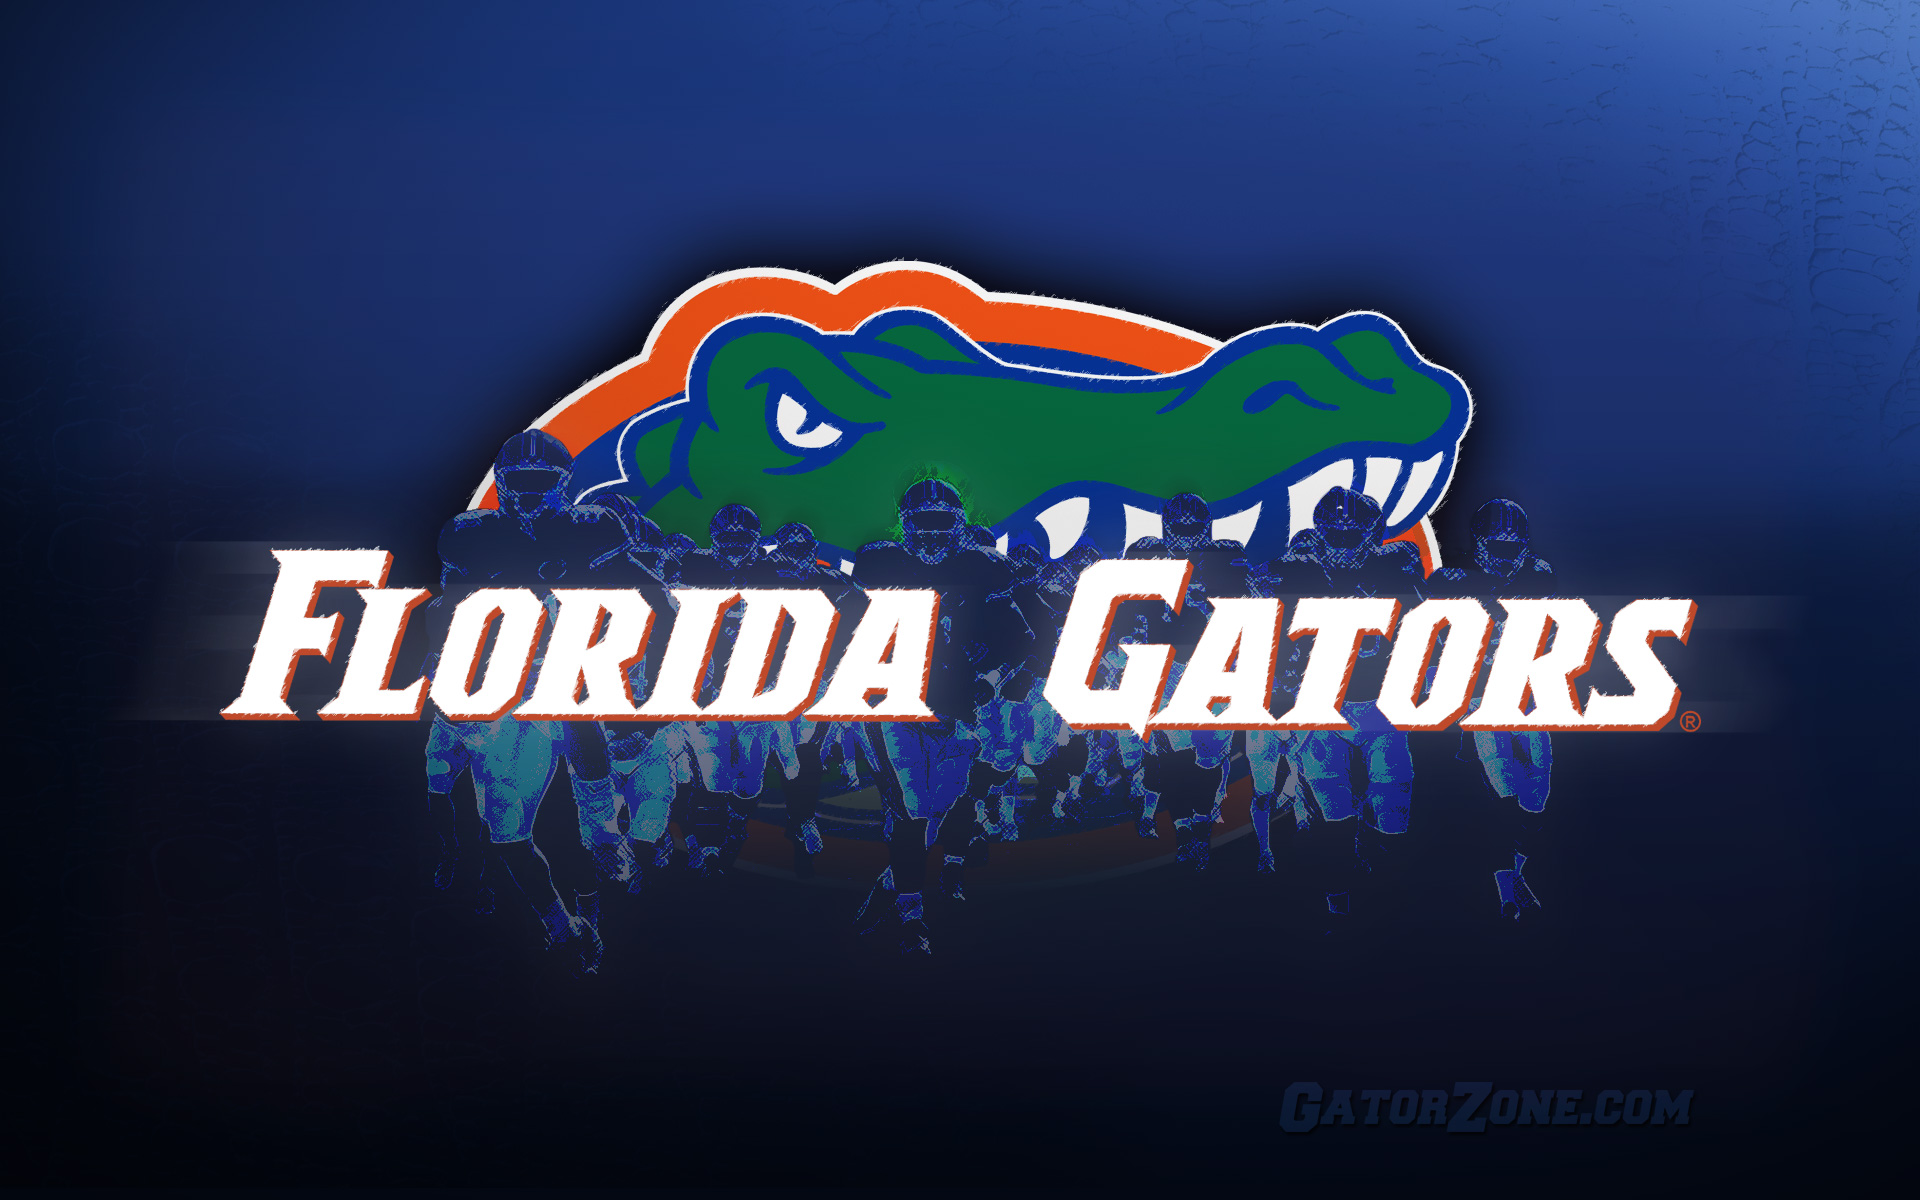 Florida Gators Football Wallpaper   Football Wallpaper HD Football 1920x1200